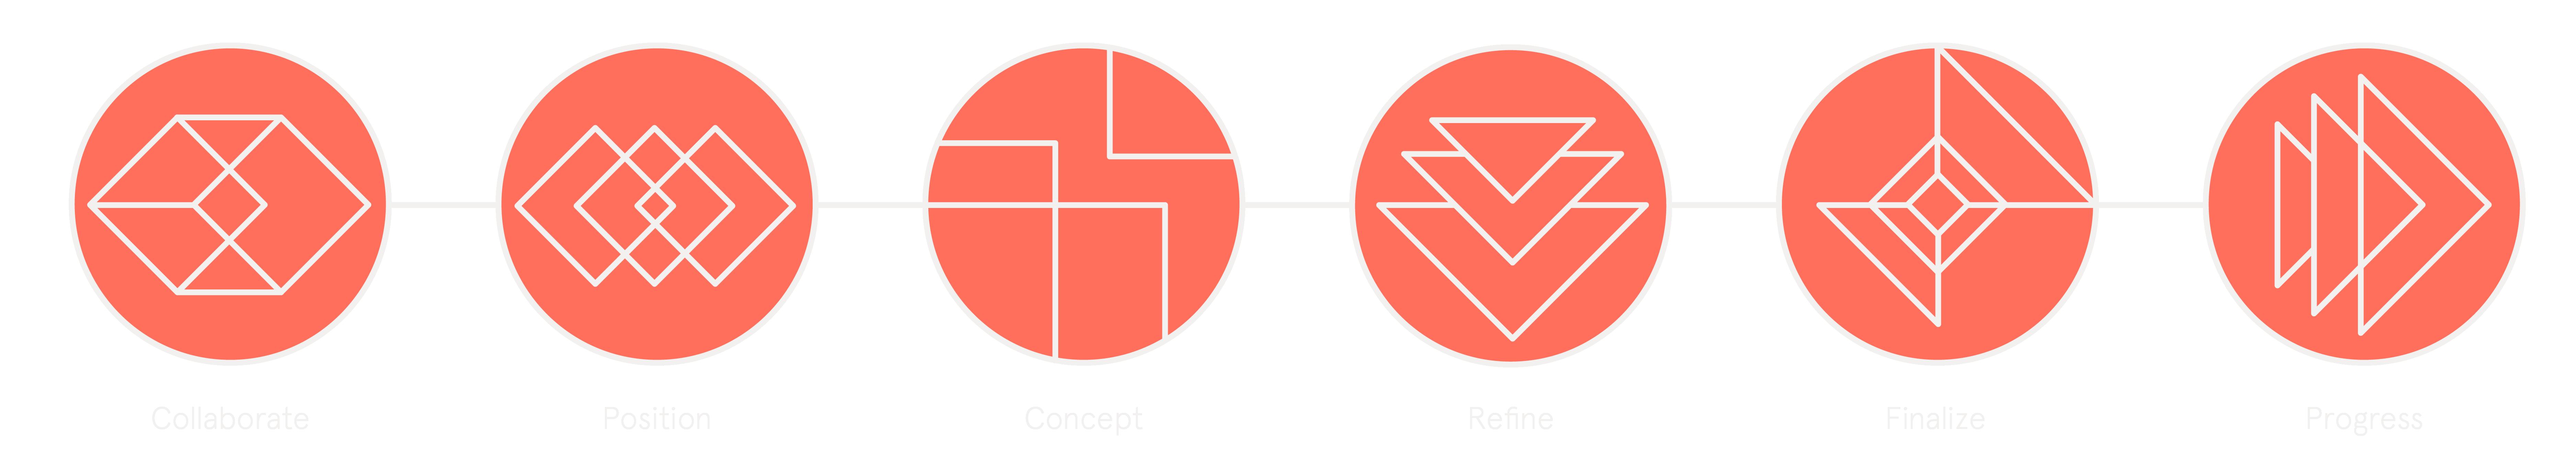 Icons_Process_V-08